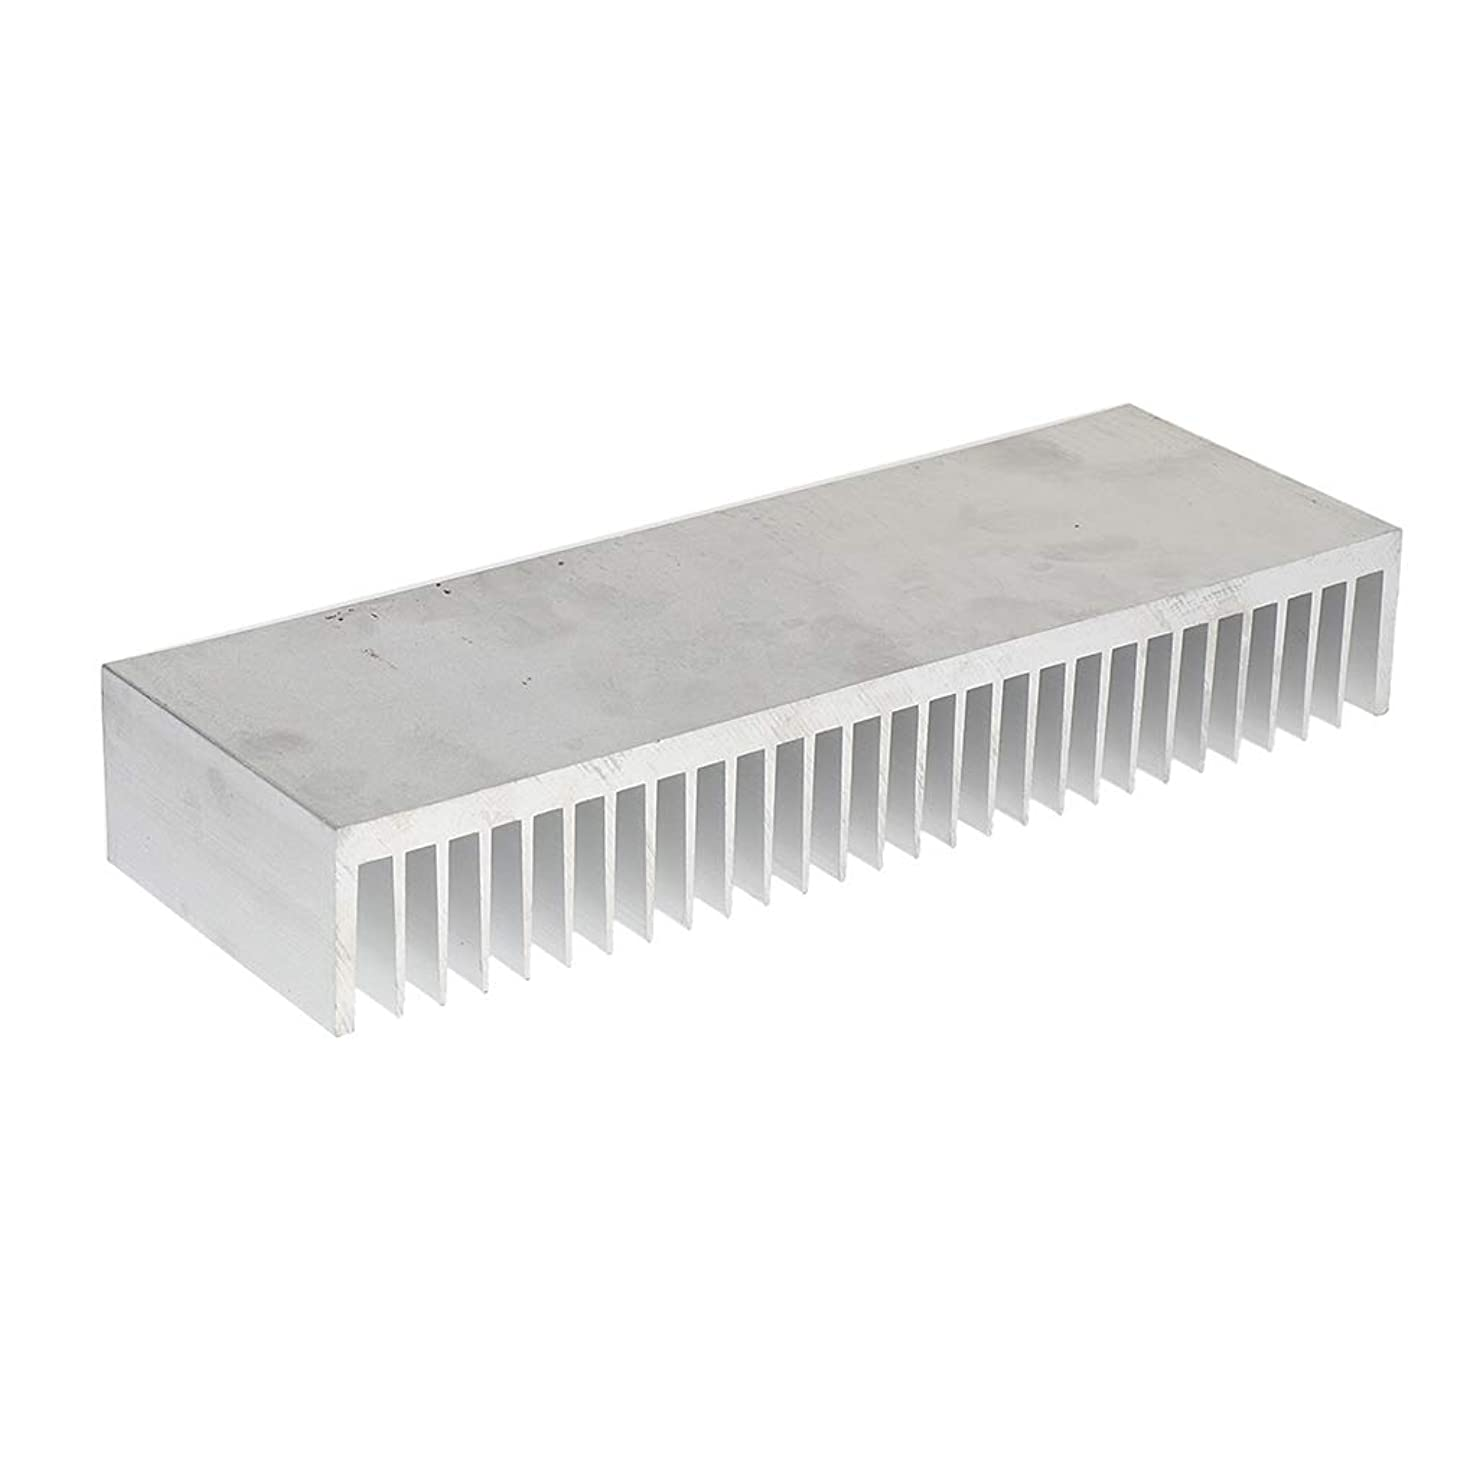 Flameer Aluminum Heatsink 100x300x50mm Cooling Radiator Cooler Transistor for 150W LED Heat Dissipation